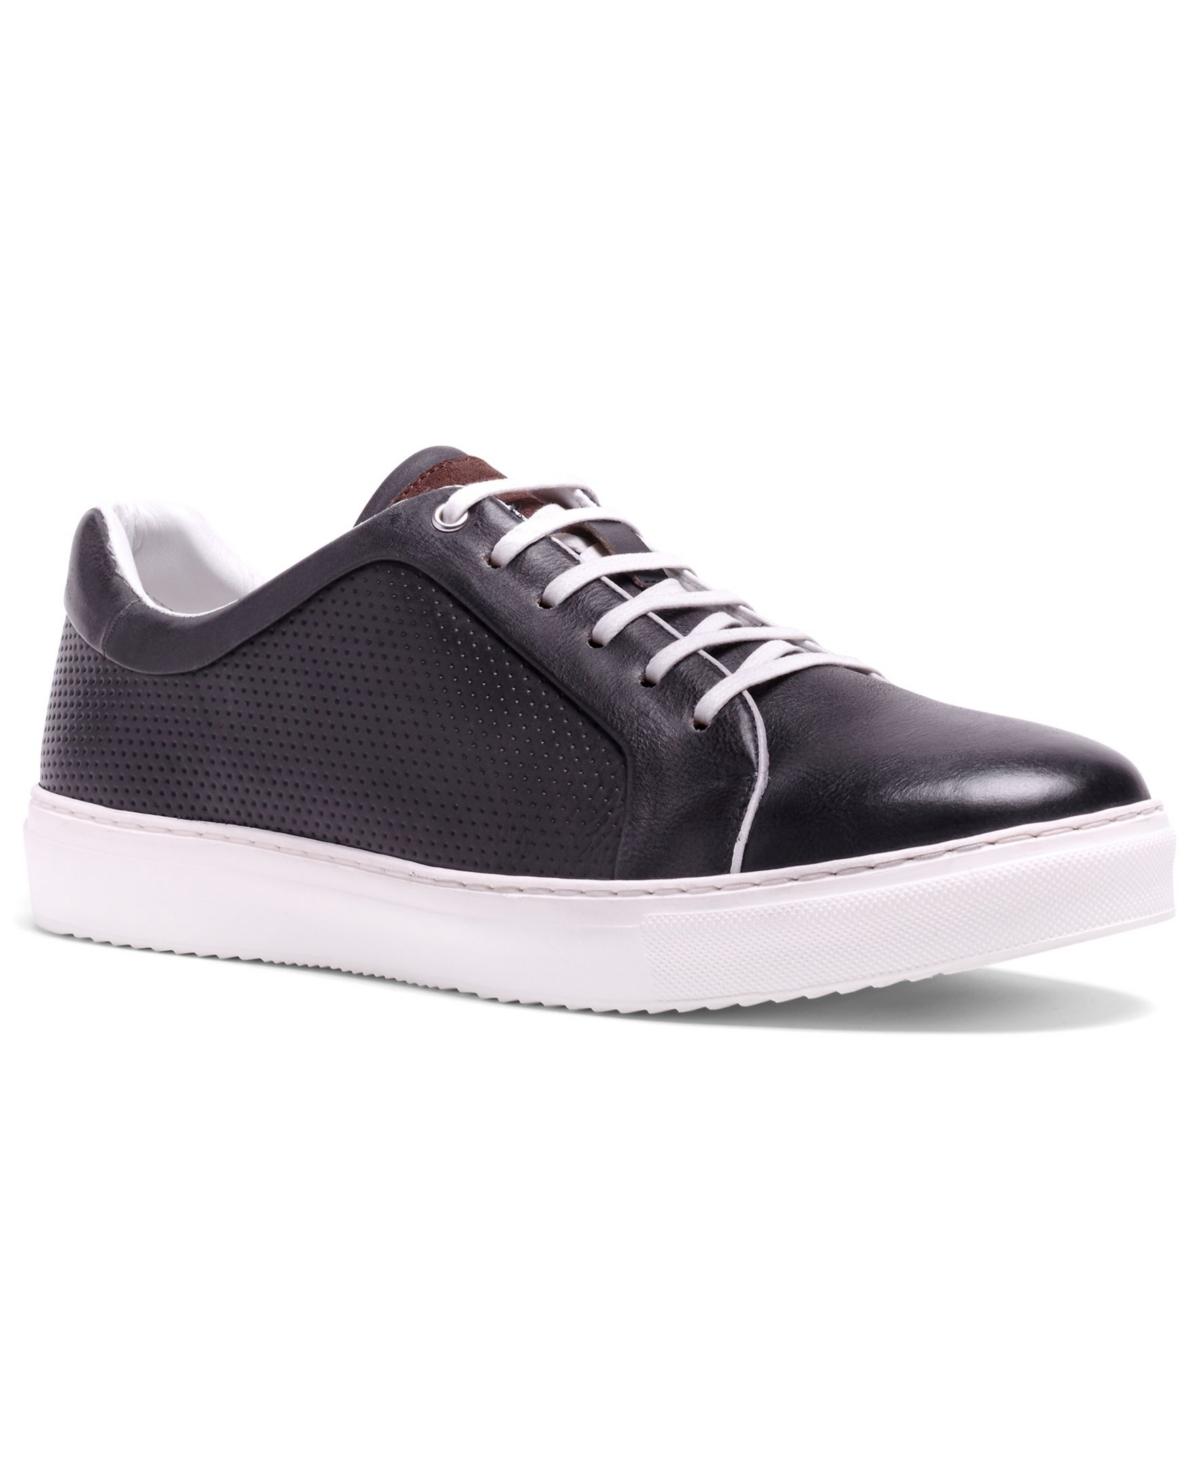 Carlos by Carlos Santana Men's Miles Low-Top Sneakers Men's Shoes